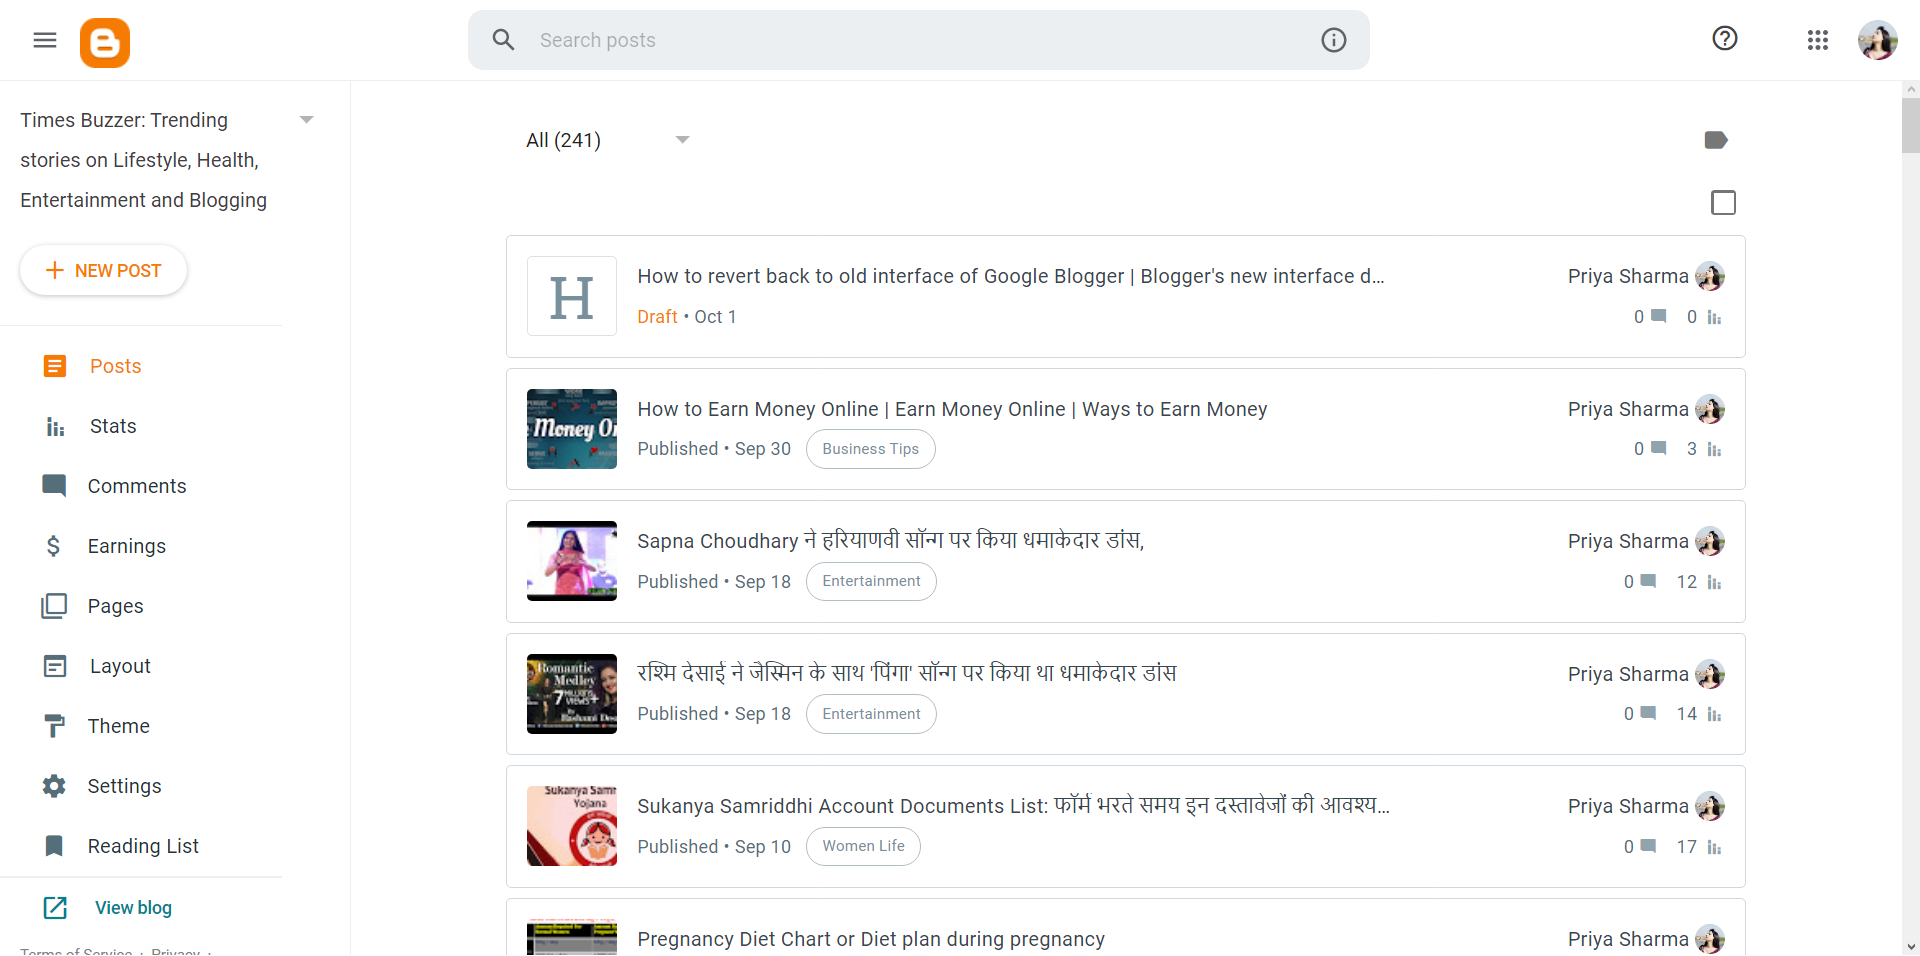 Google Blogger New Interface